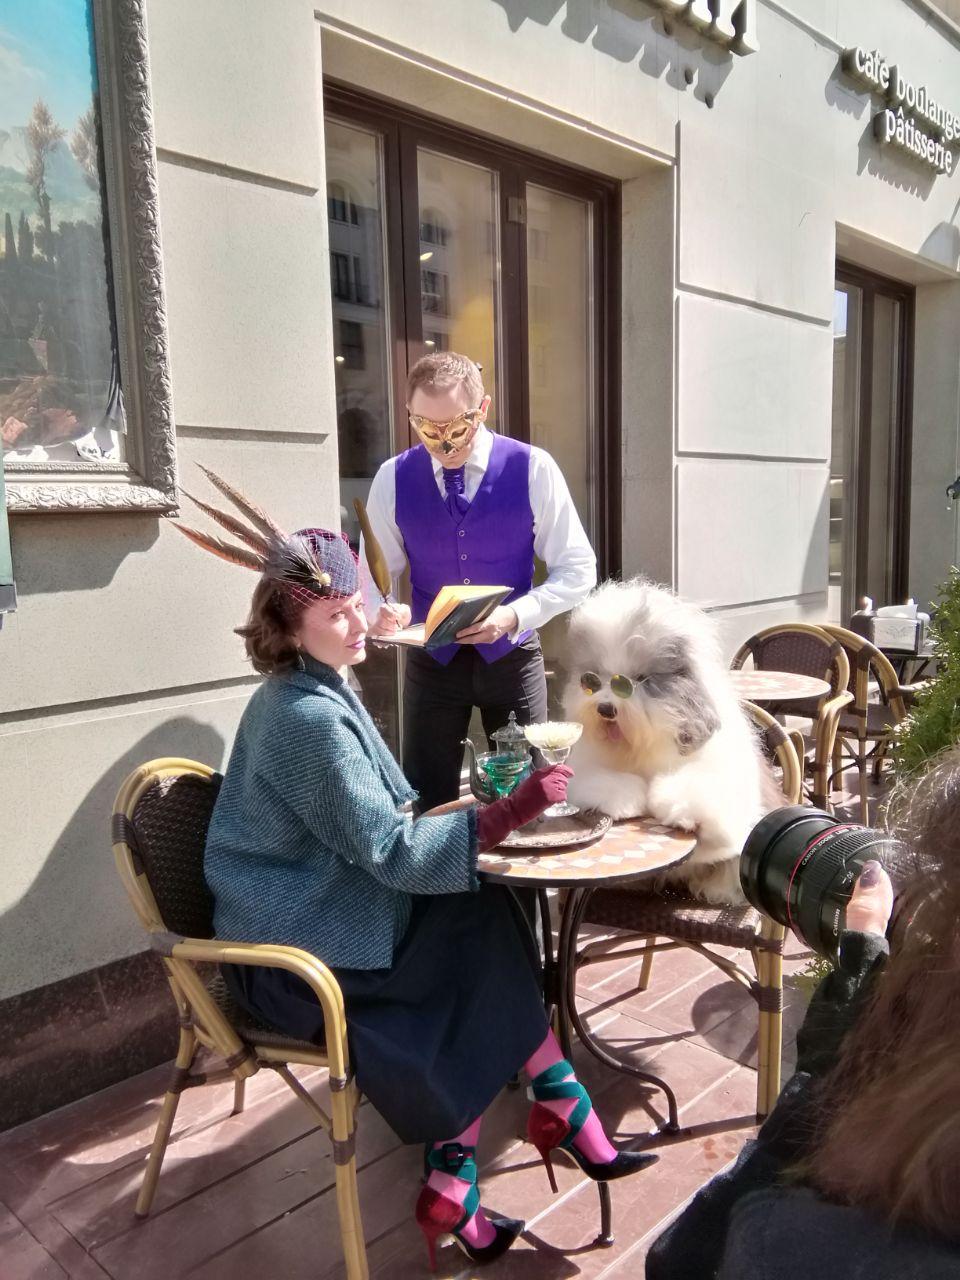 Photos from Tverskaya street